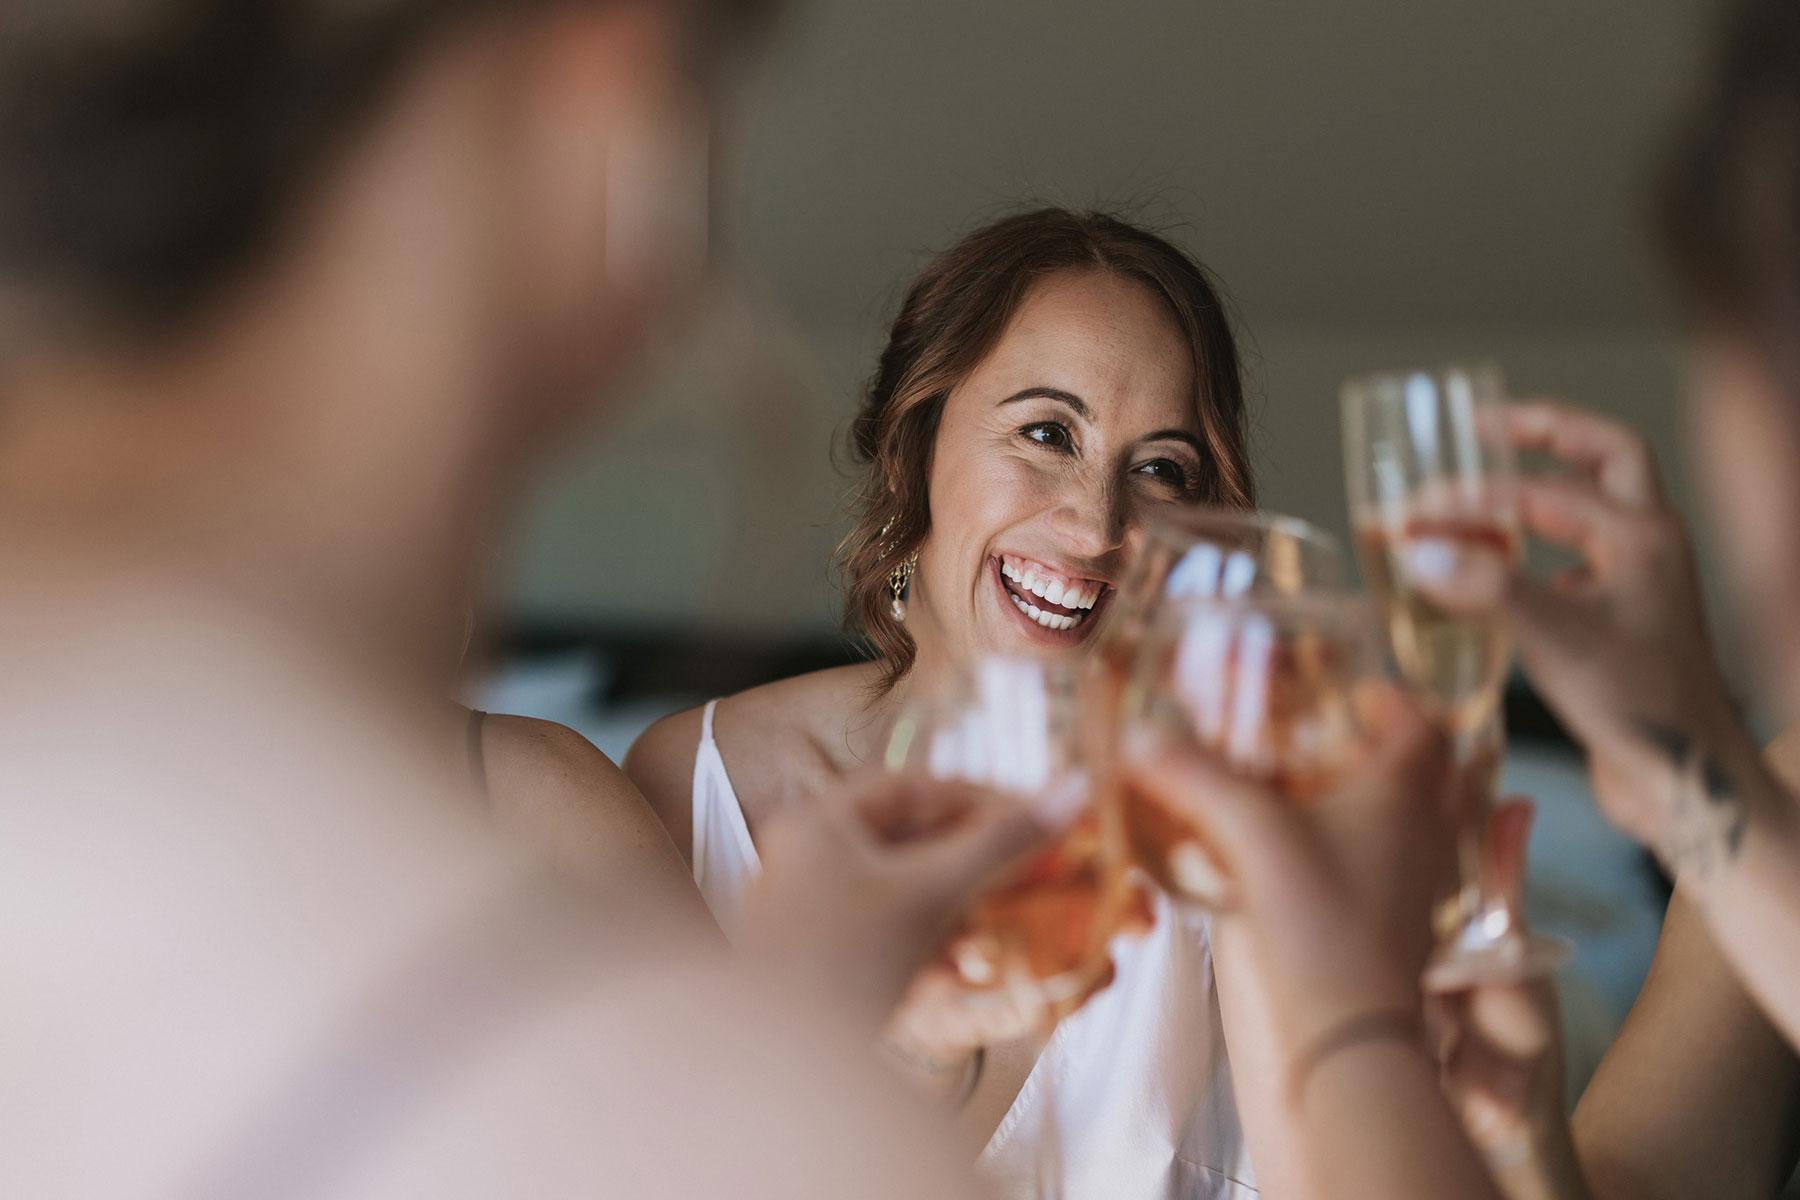 newfound-j-n-orua-beach-house-coromandel-wedding-photographers-122